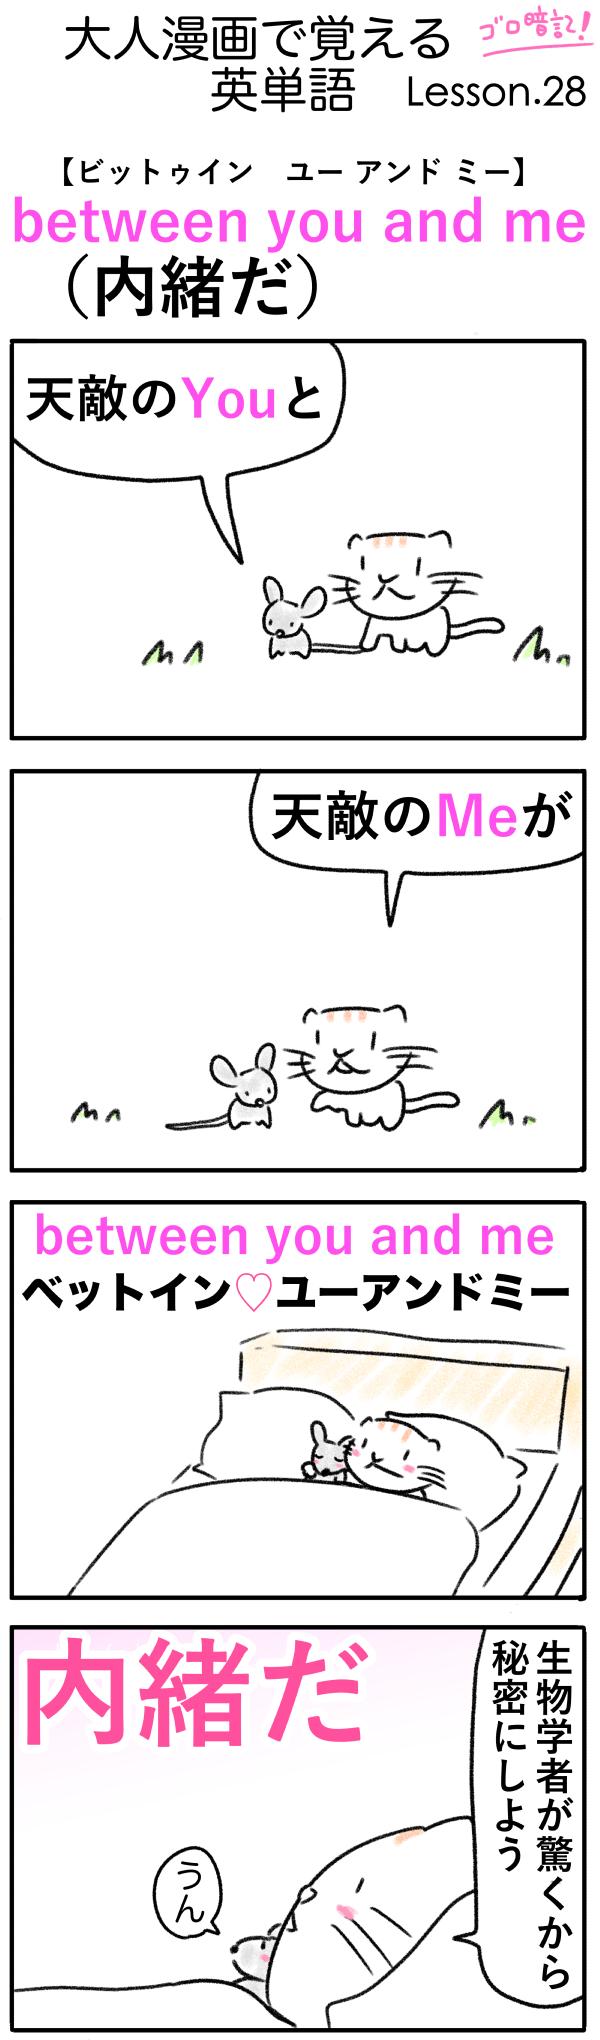 between you and me(内緒だ)の語呂合わせ英単語